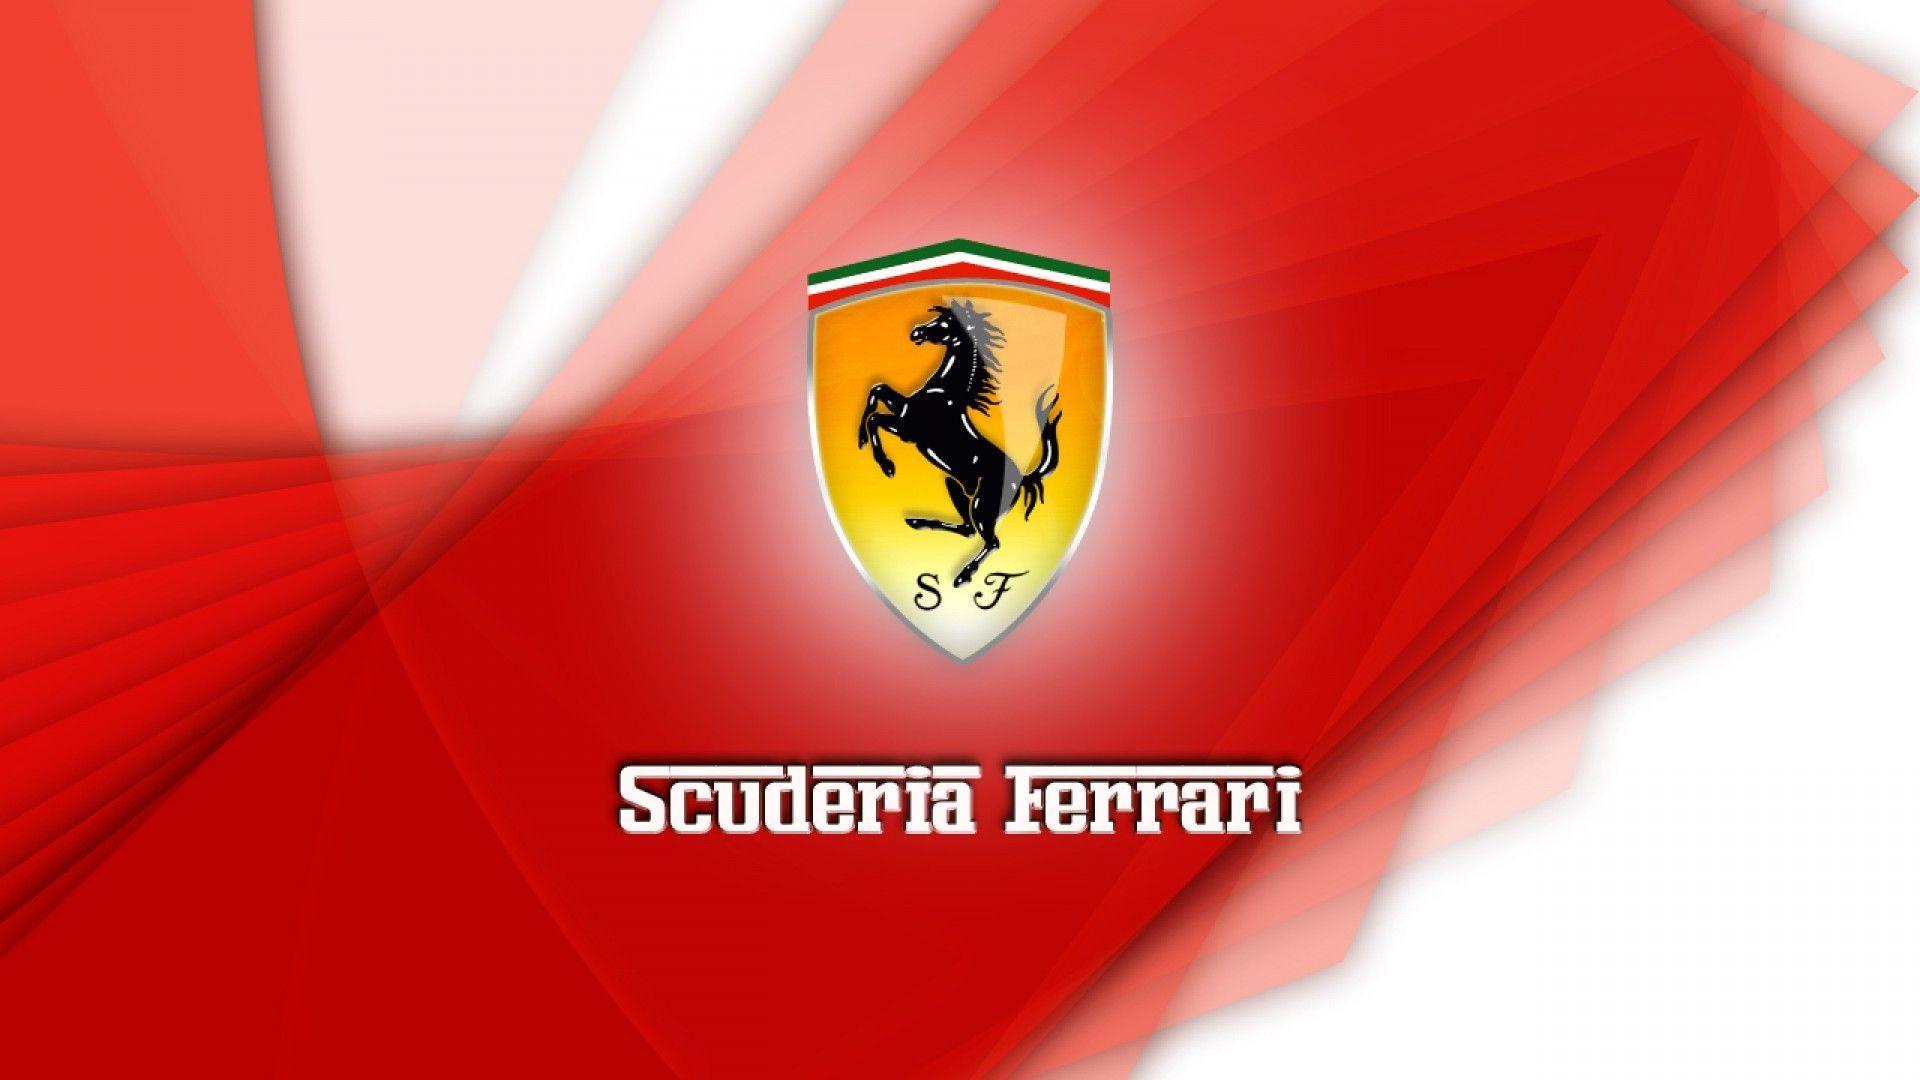 Ferrari Logo Wallpaper - Brand & Logo Wallpapers - Wholles.com